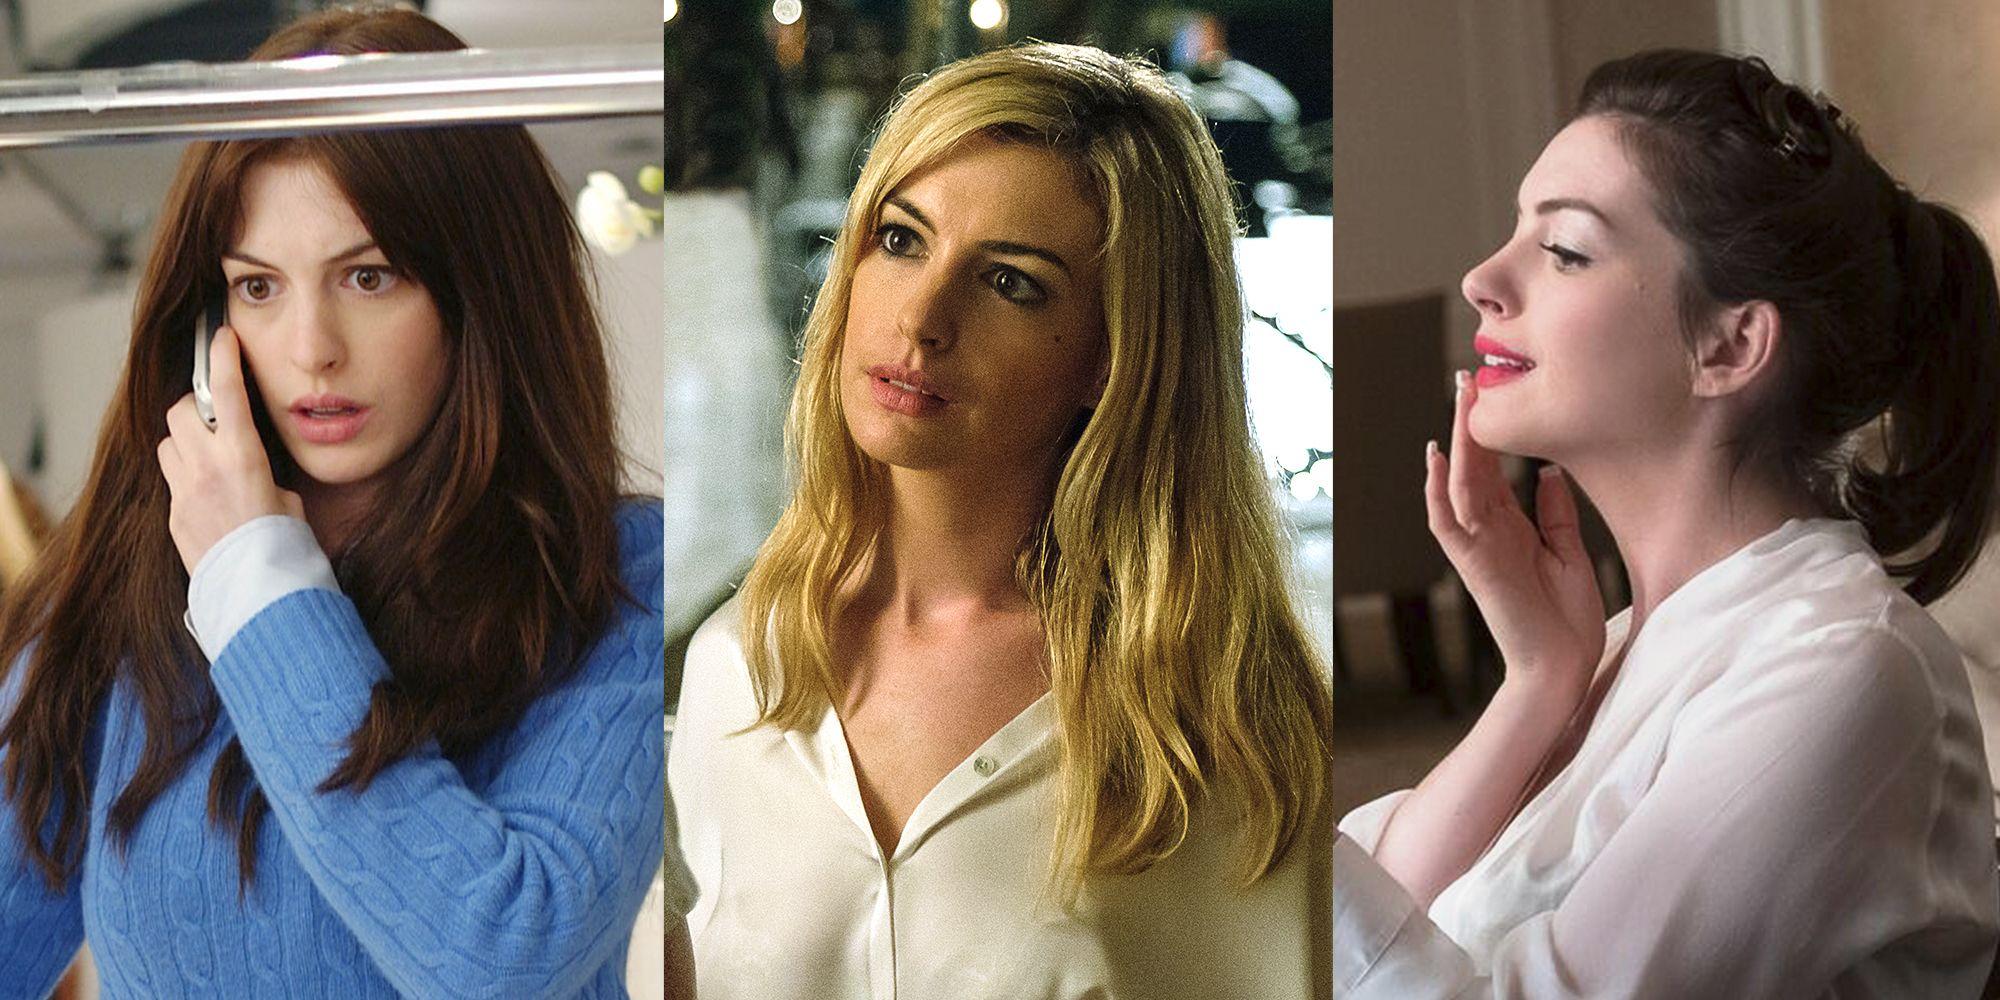 Hathaway in the Devil Wears Prada, Serenity, and Oceans 8.